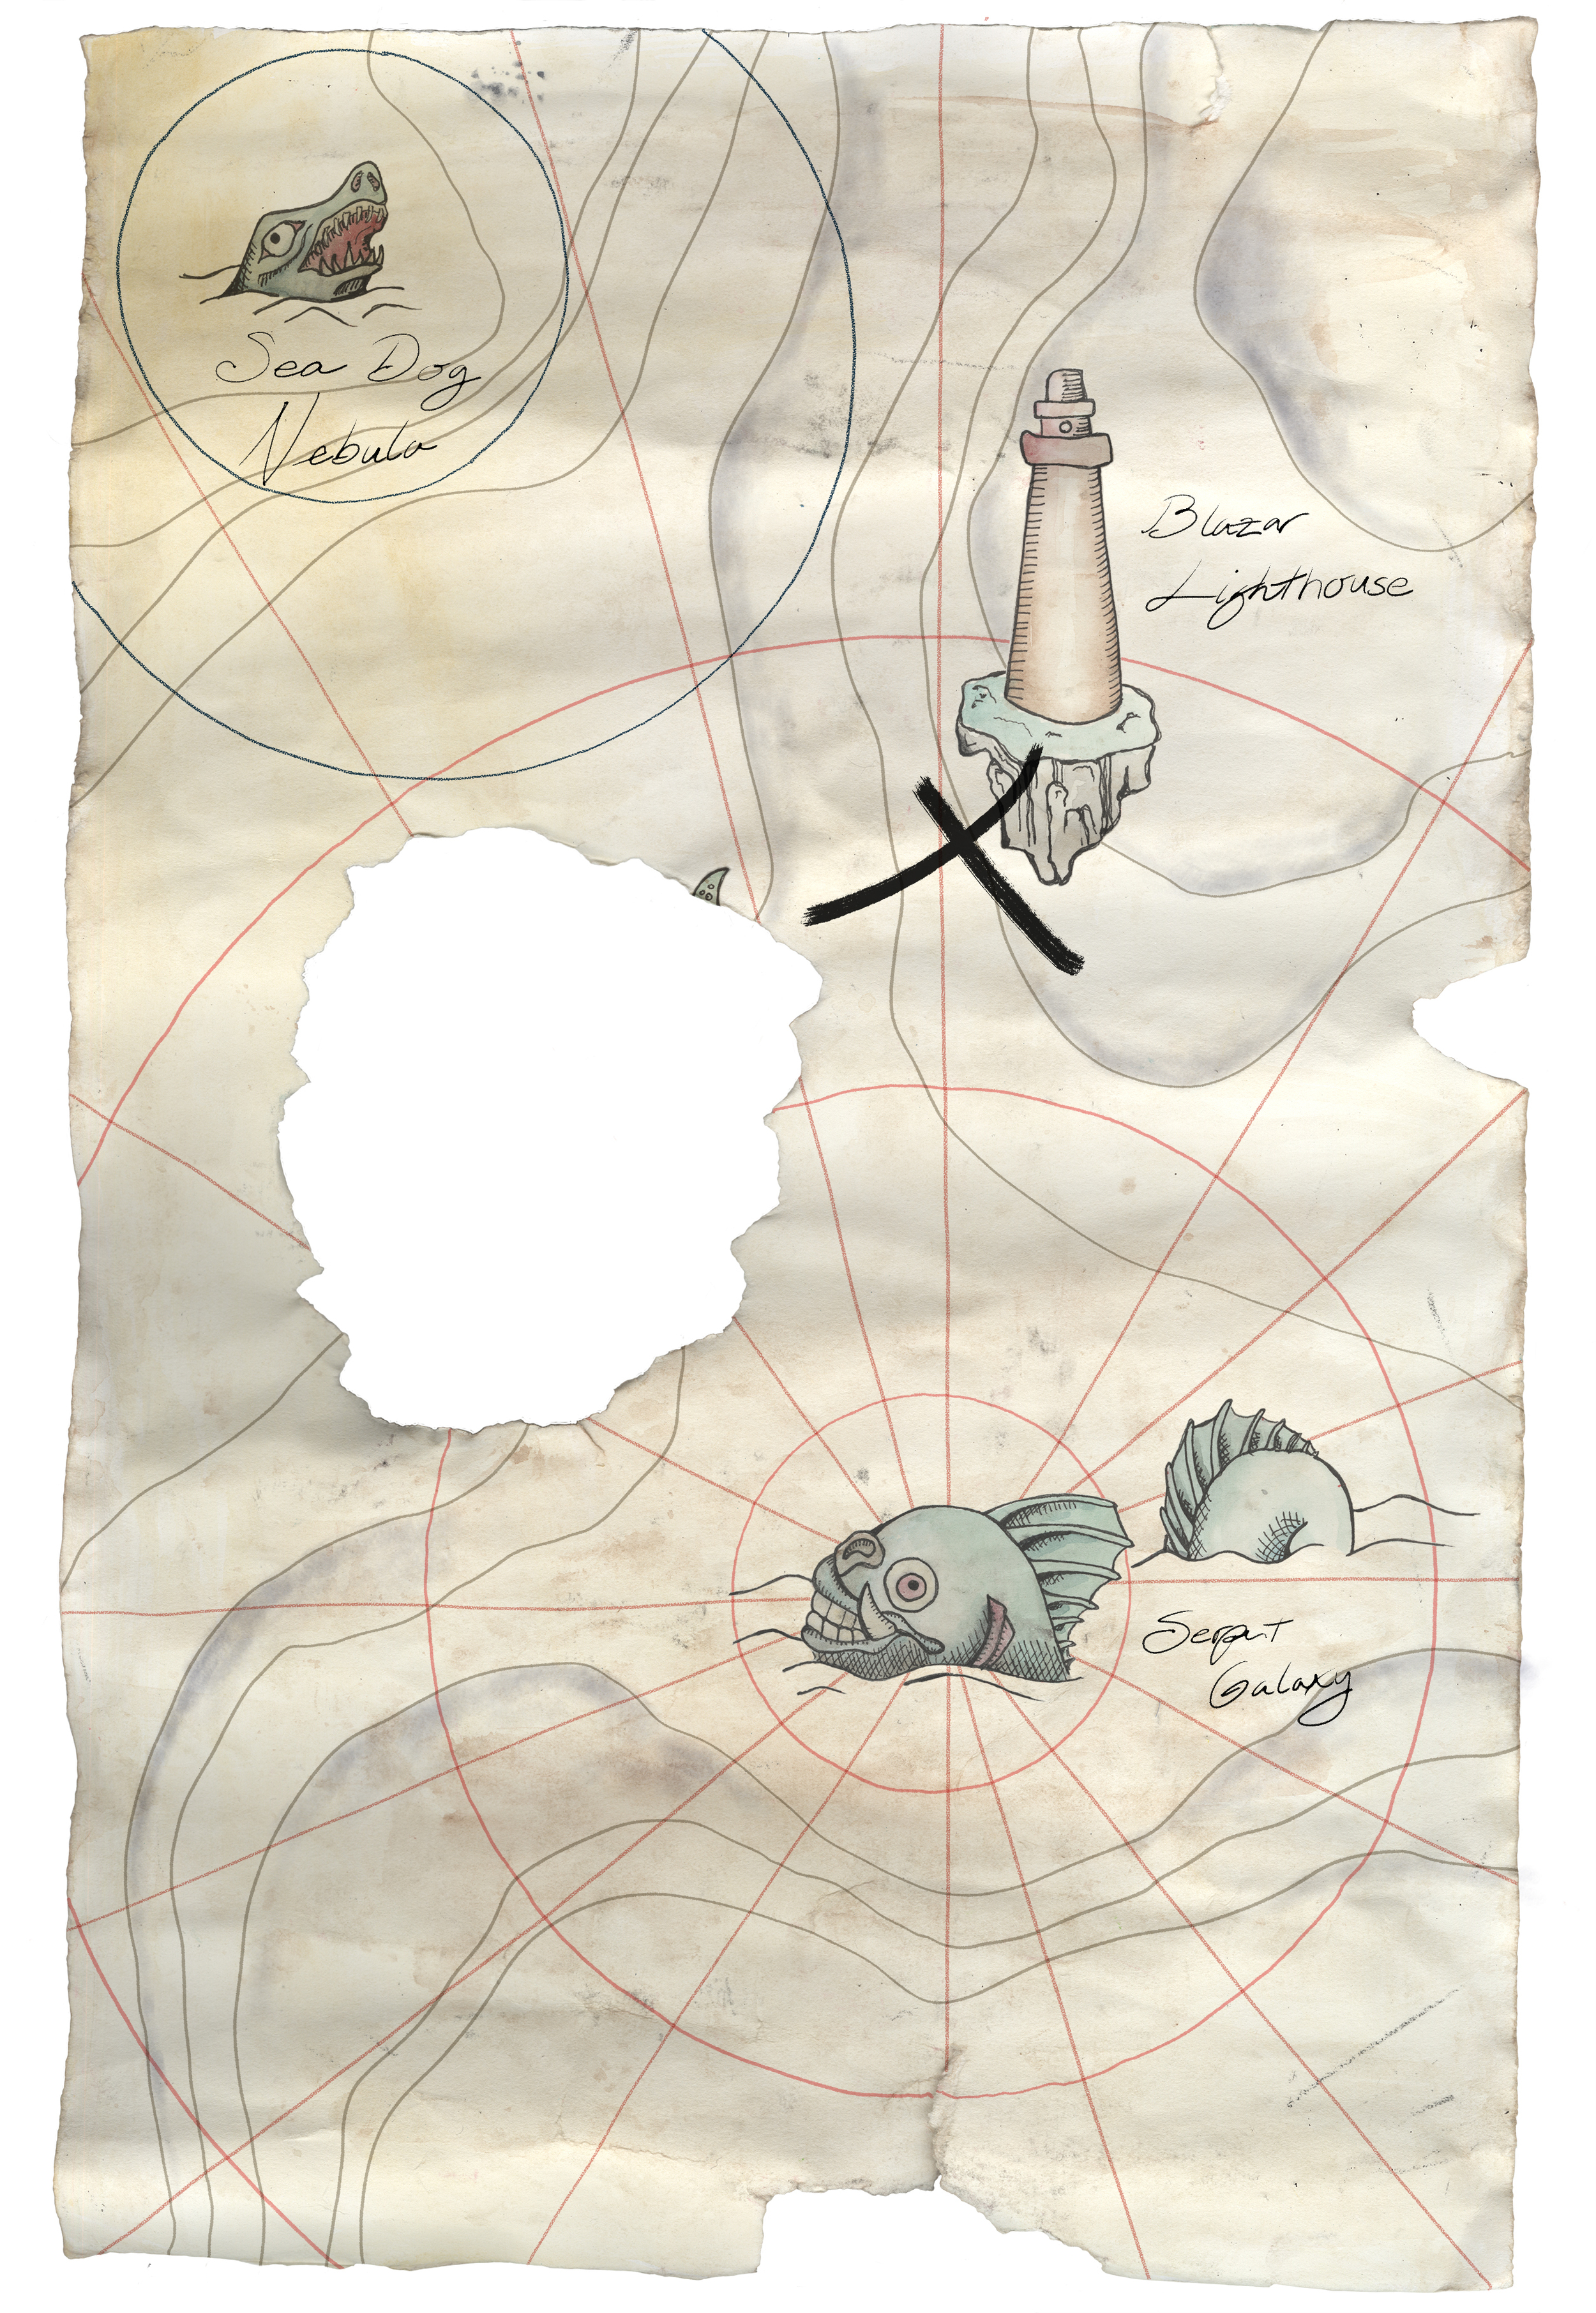 Space Pirate Treasure Map